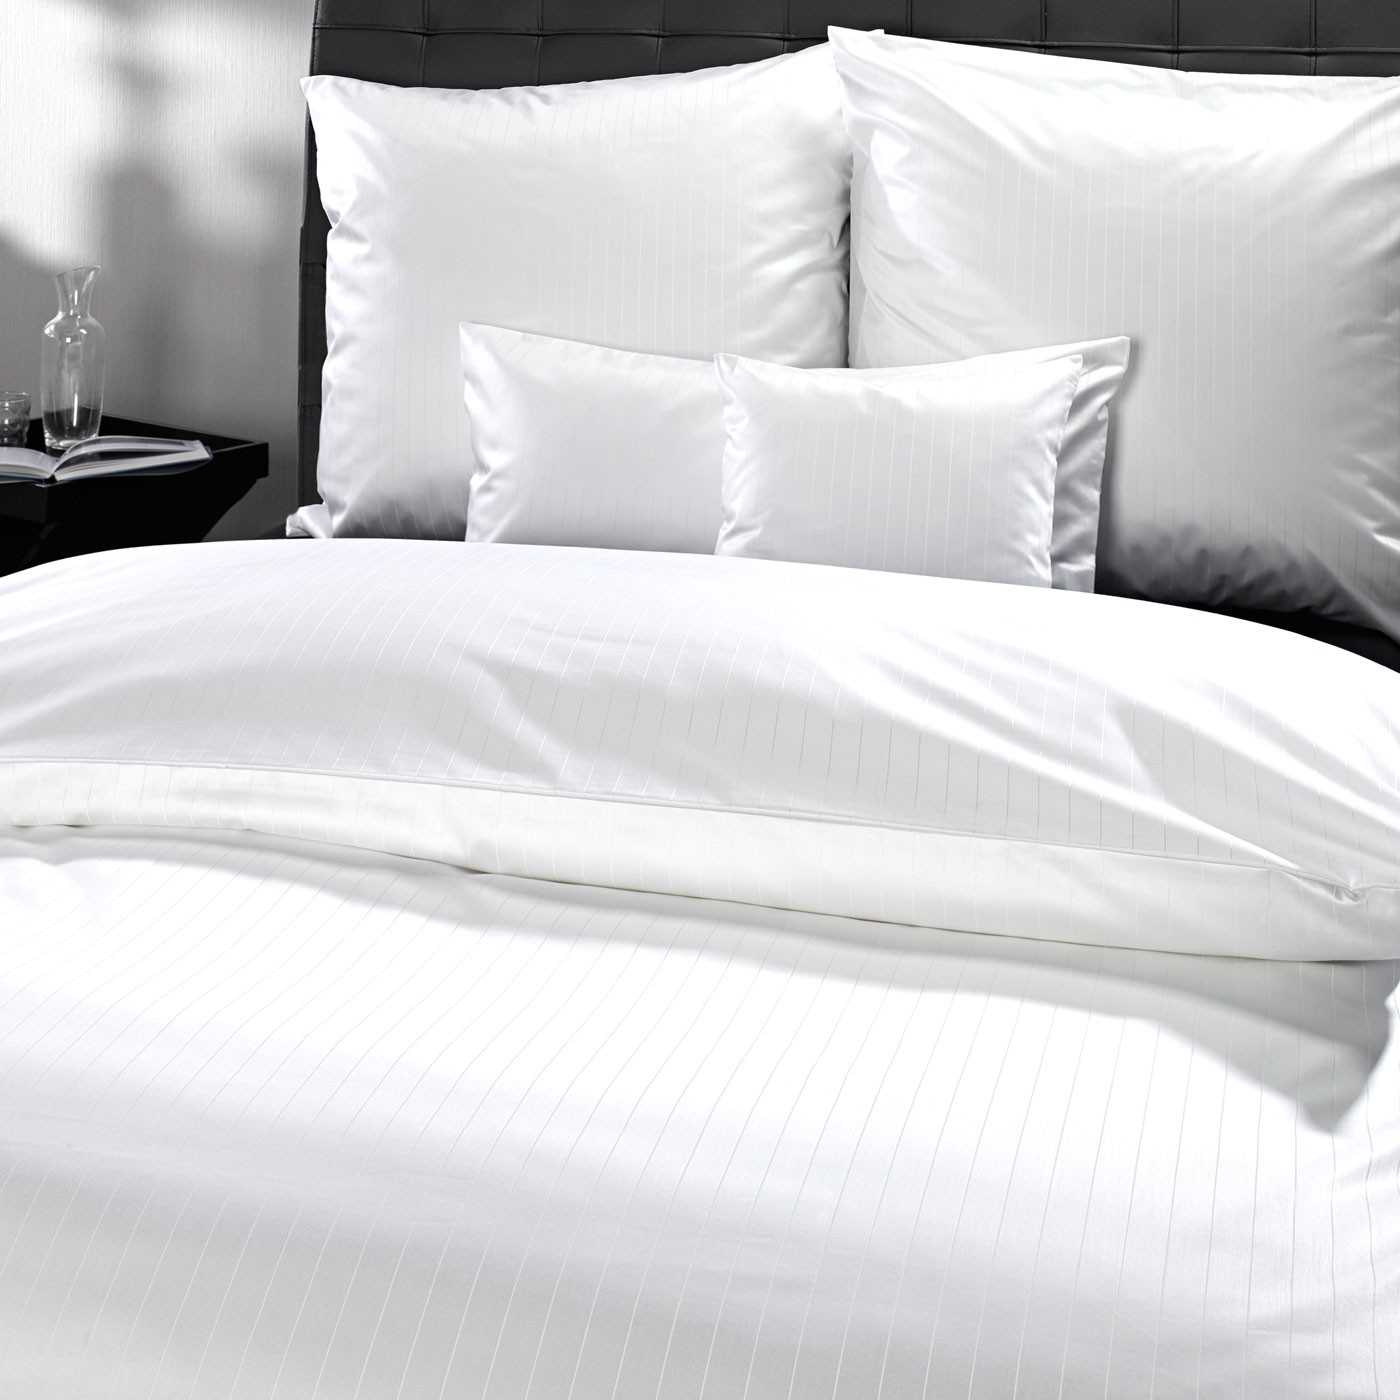 bettw sche curt bauer ferrara 2452 wei. Black Bedroom Furniture Sets. Home Design Ideas